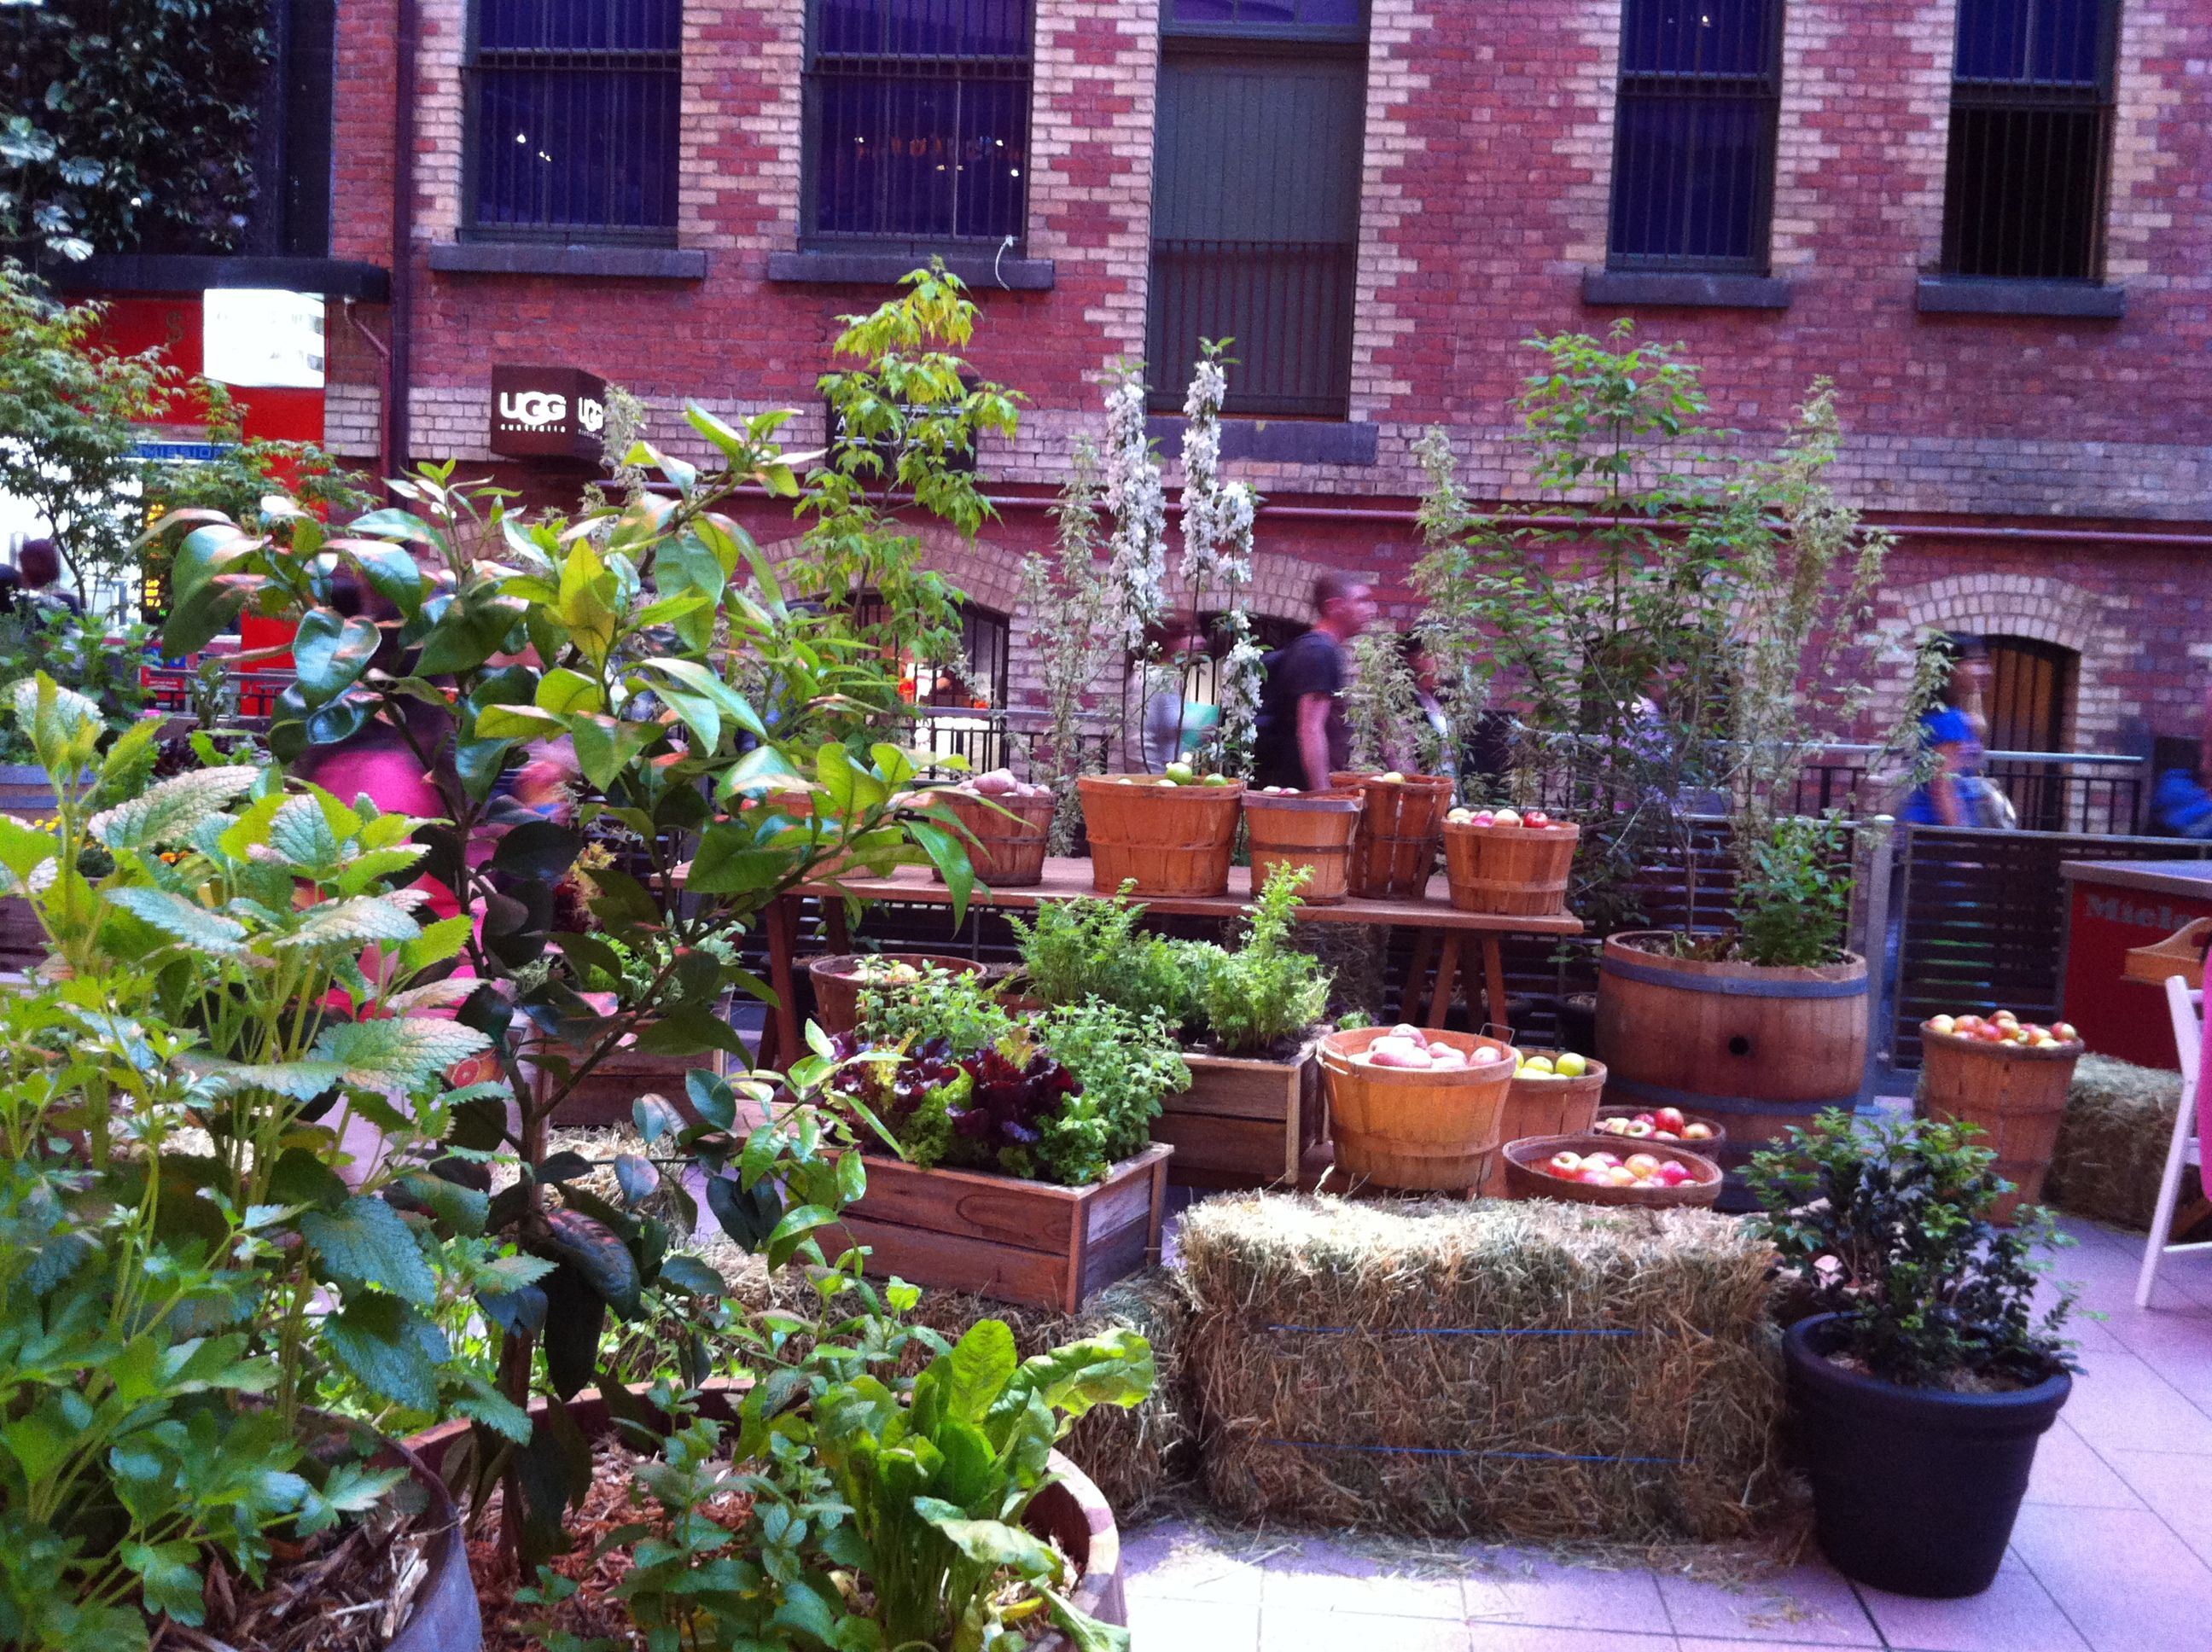 A Kitchen garden in Melbourne Central Shopping Centre ...